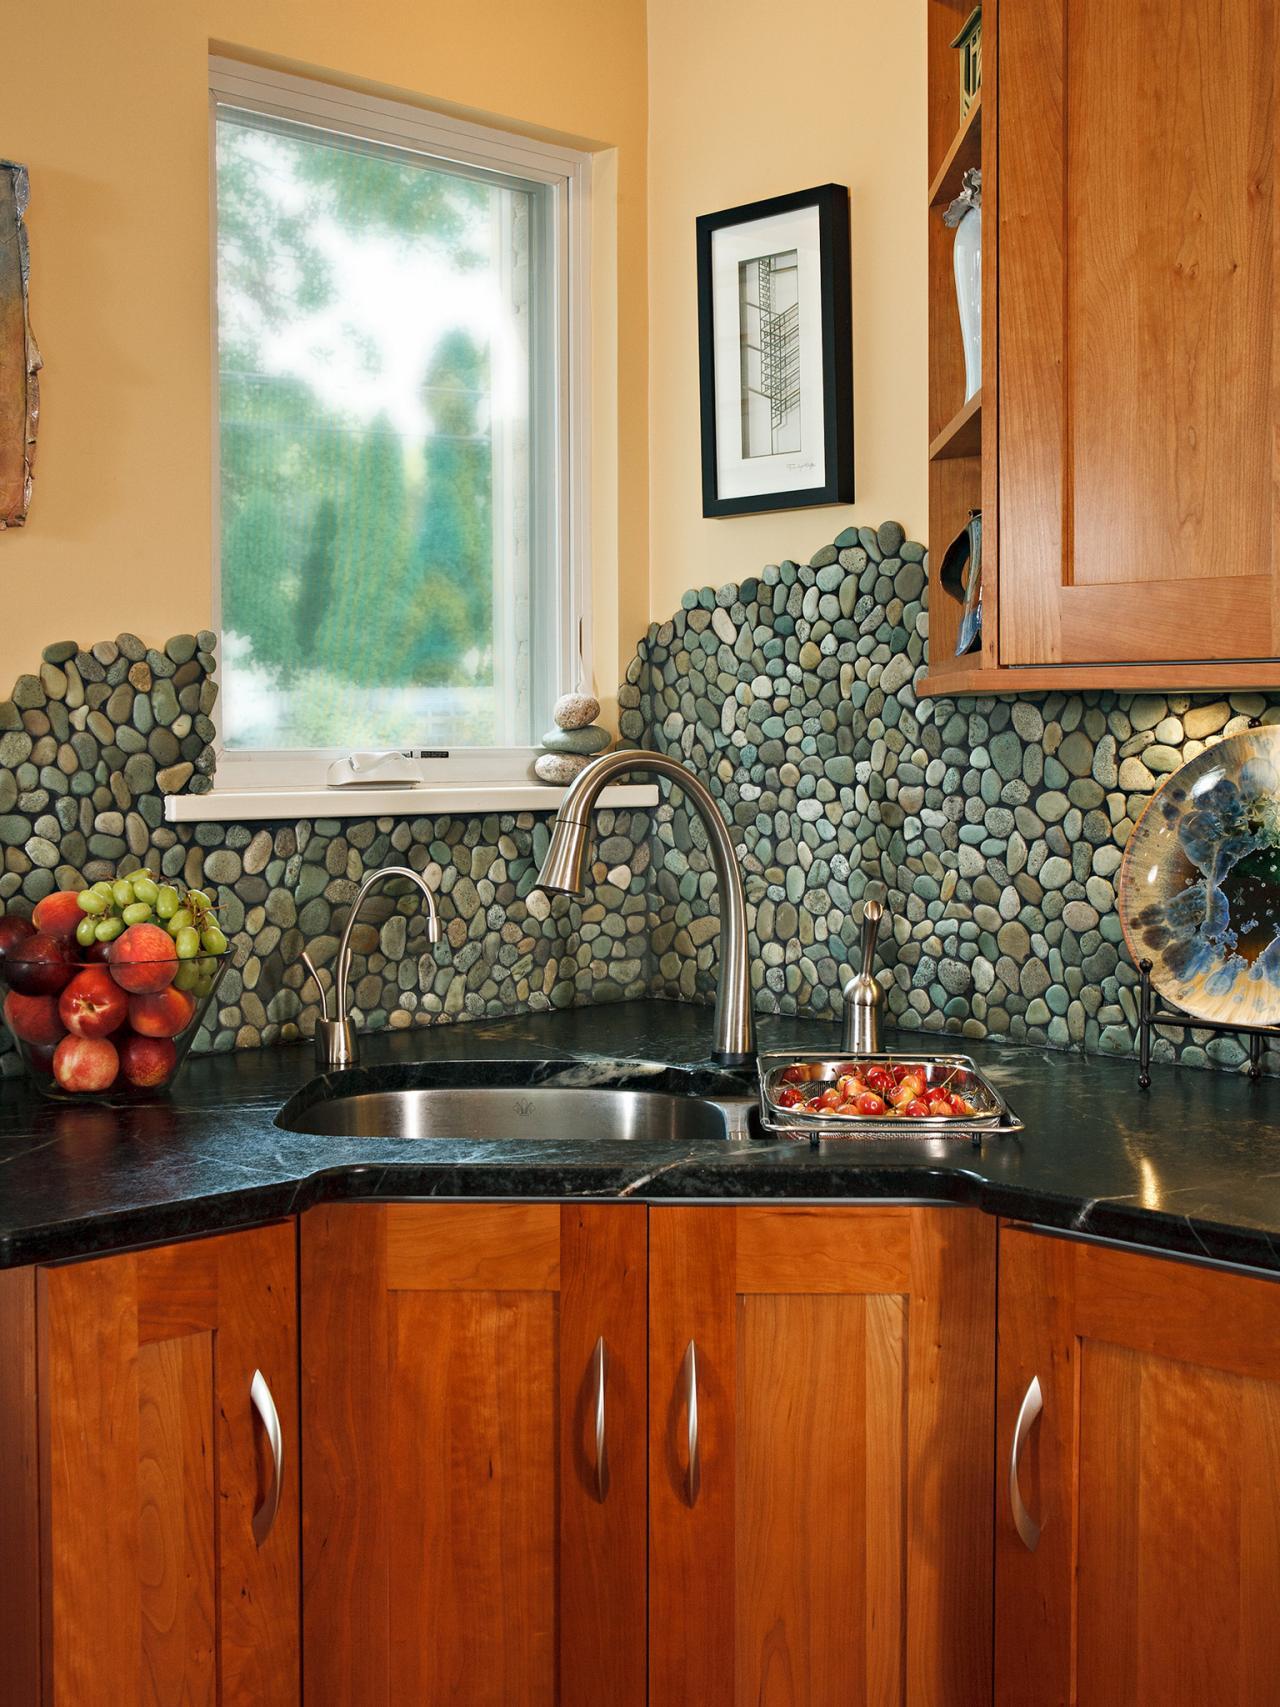 Uncategorized How To Make A Backsplash In Your Kitchen how to make a backsplash in your kitchen ceramic tile backsplashes pictures ideas tips from hgtv hgtv